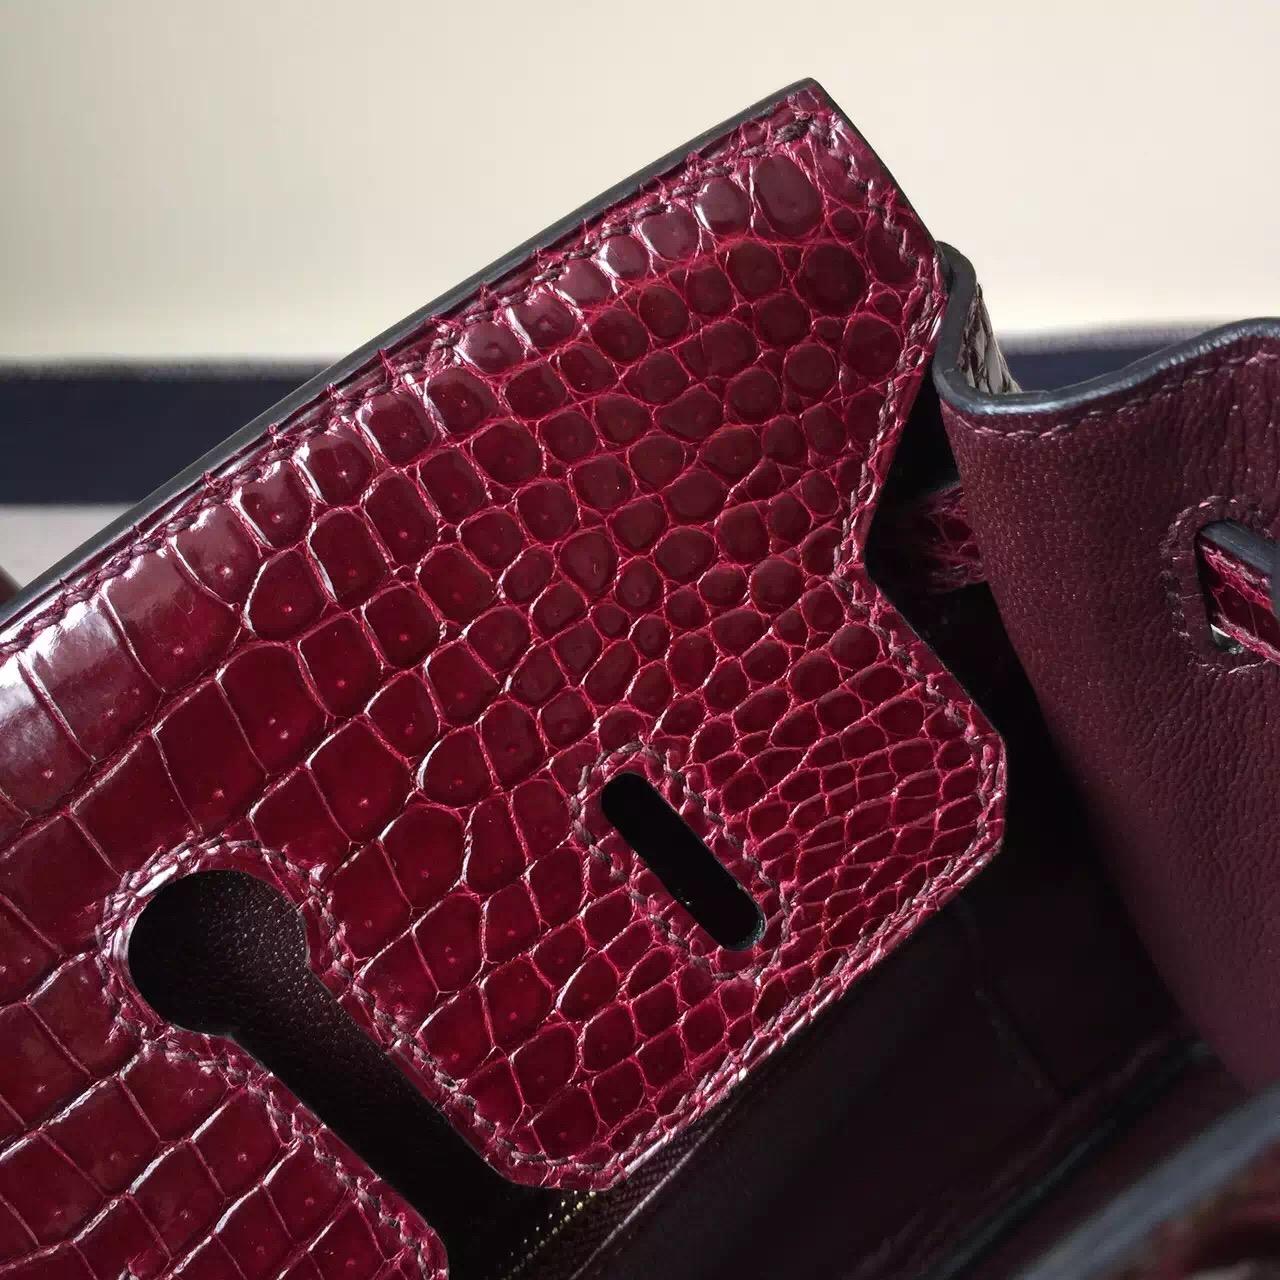 Hermes Crocodile Shiny Leather Birkin25 Bag in CK57 Bordeaux